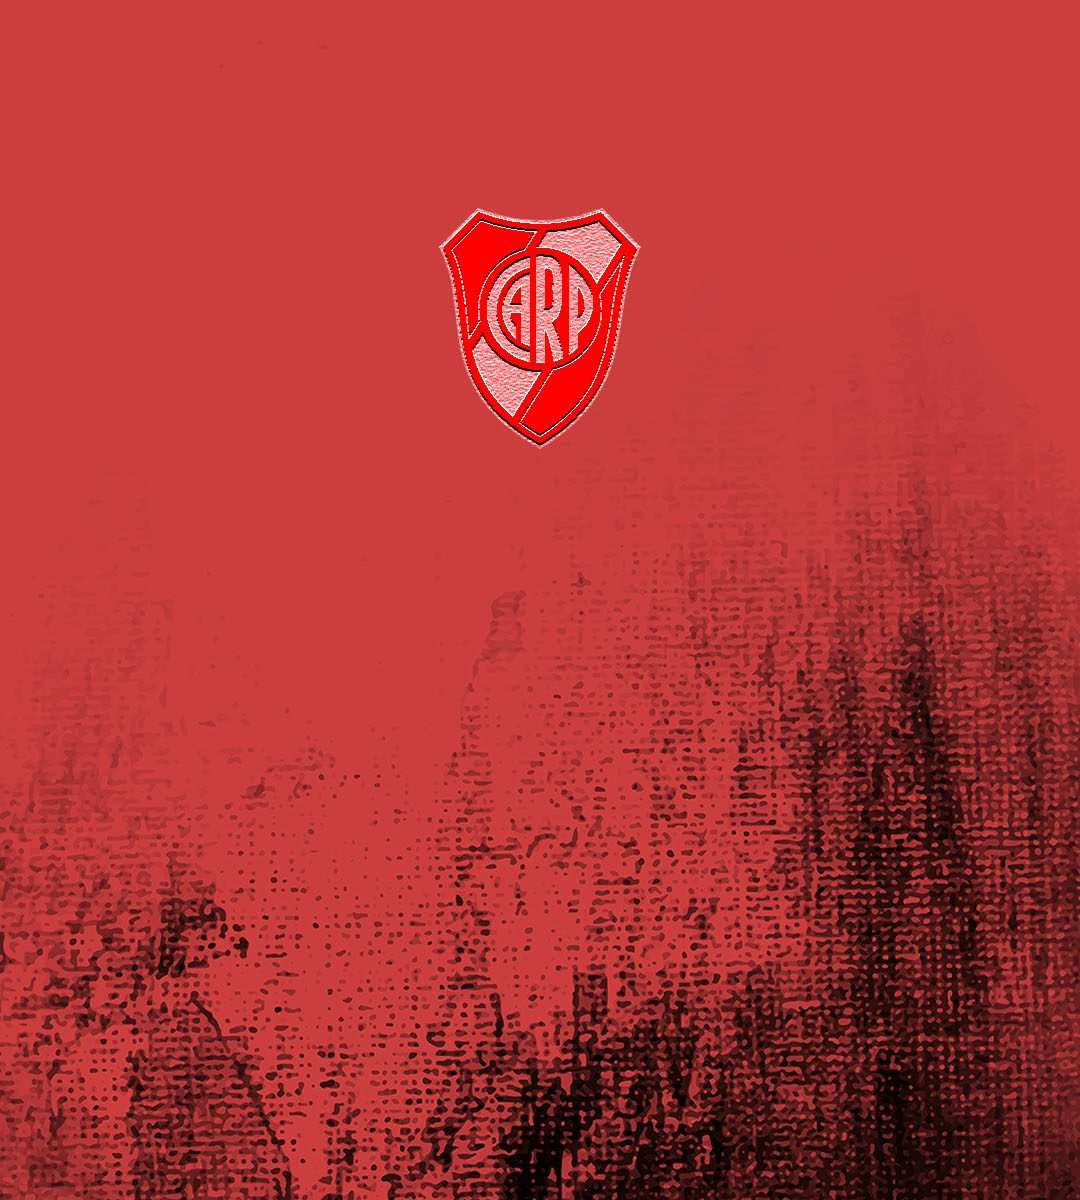 imagenes-de-river-plate-para-telefono-celular-fondos-de-pantalla-wallpaper-de-River-Escudo River Plate sobre fondo rojo y negro